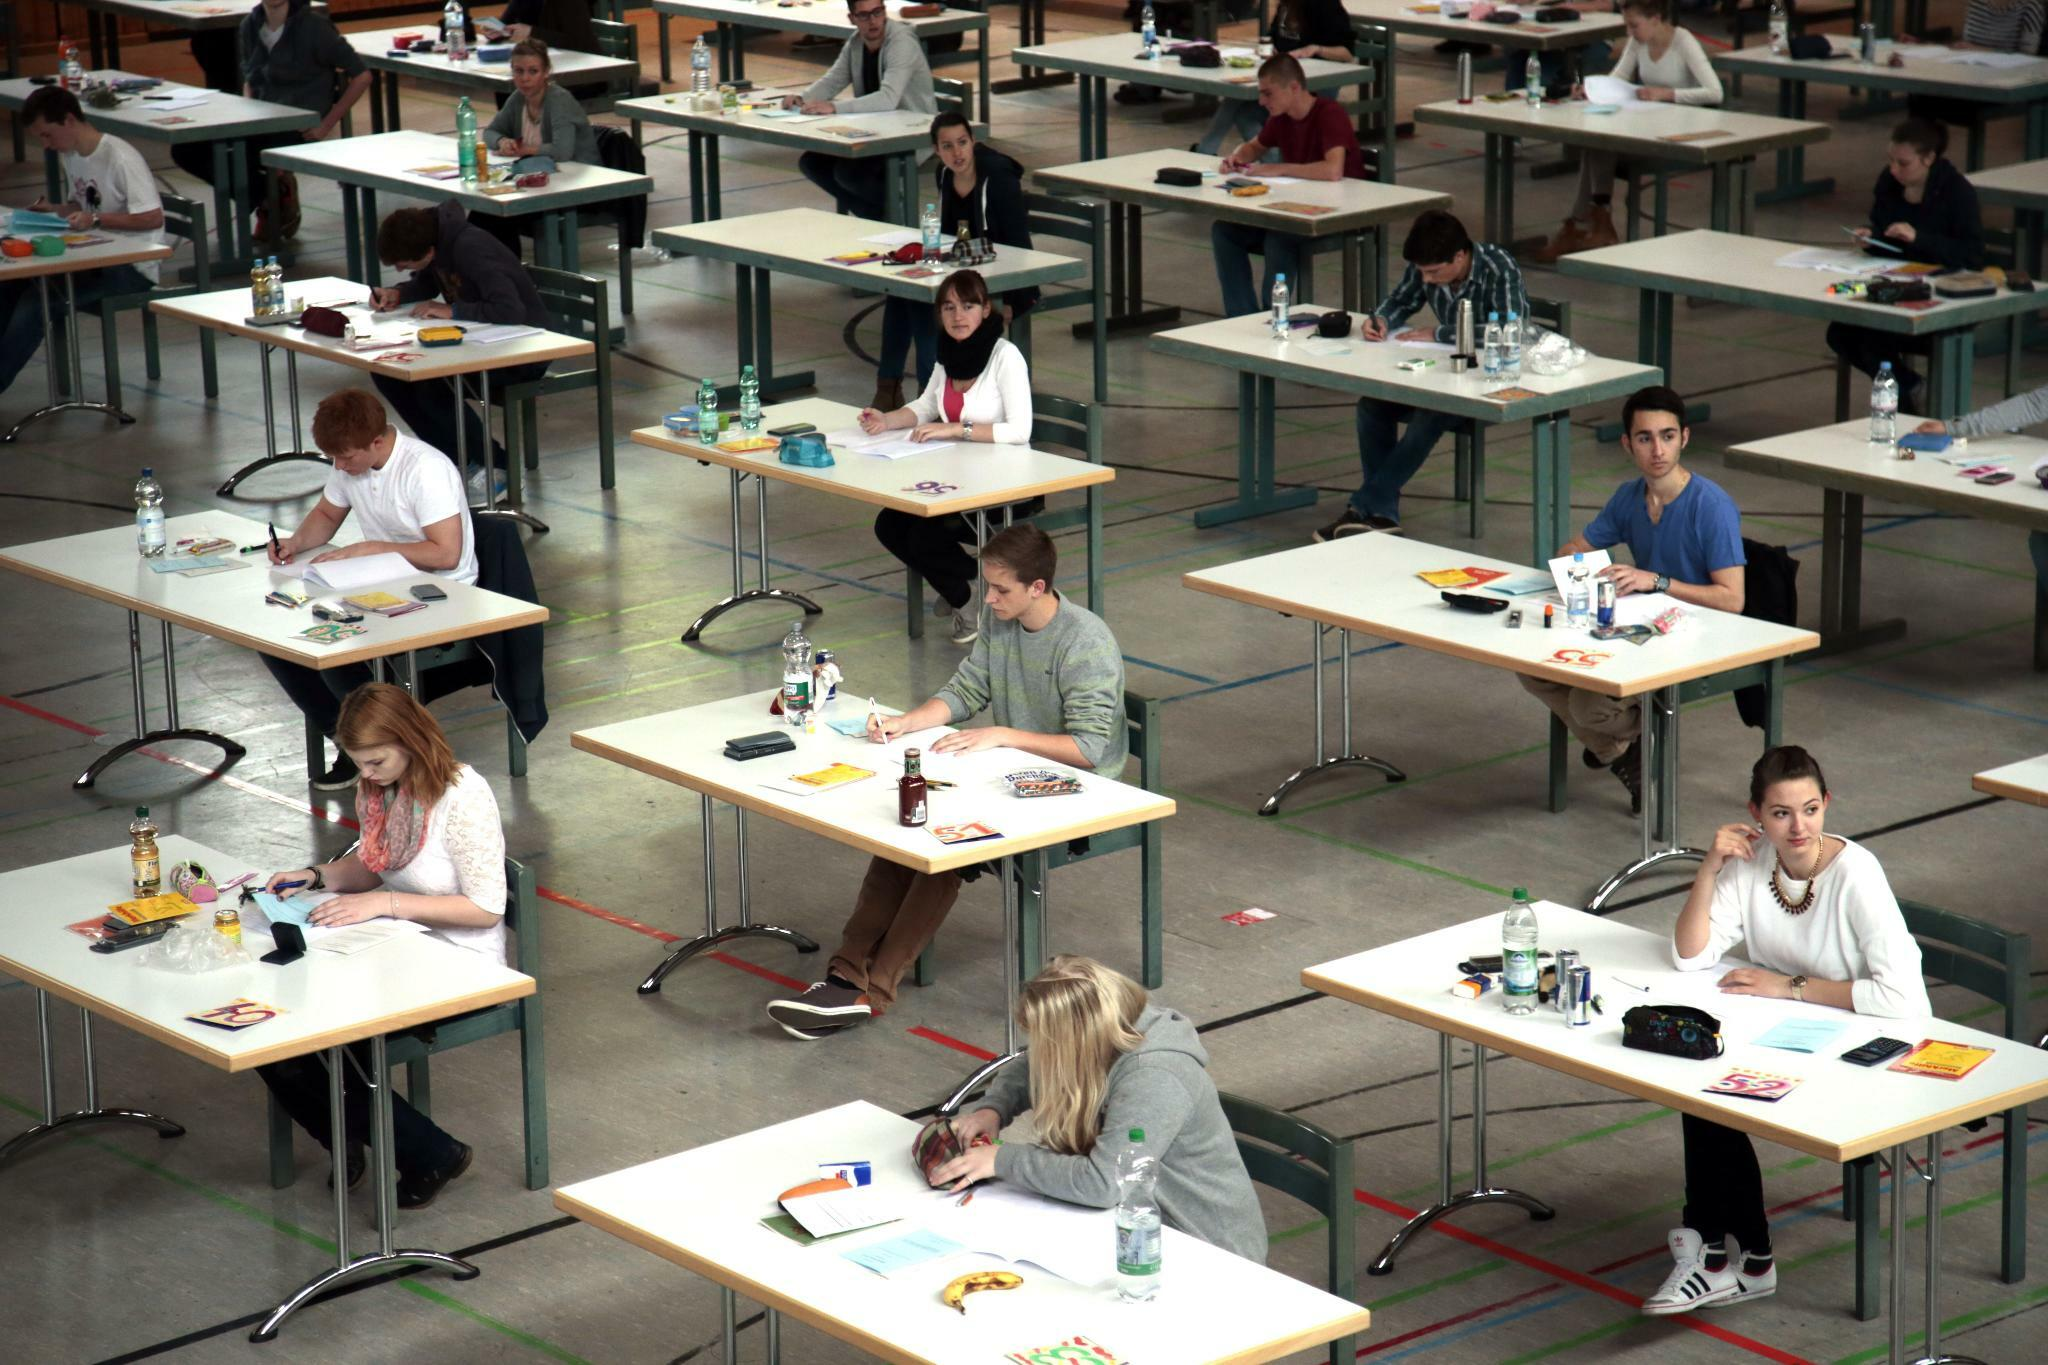 Schule: Abiturienten erzielen immer bessere Noten